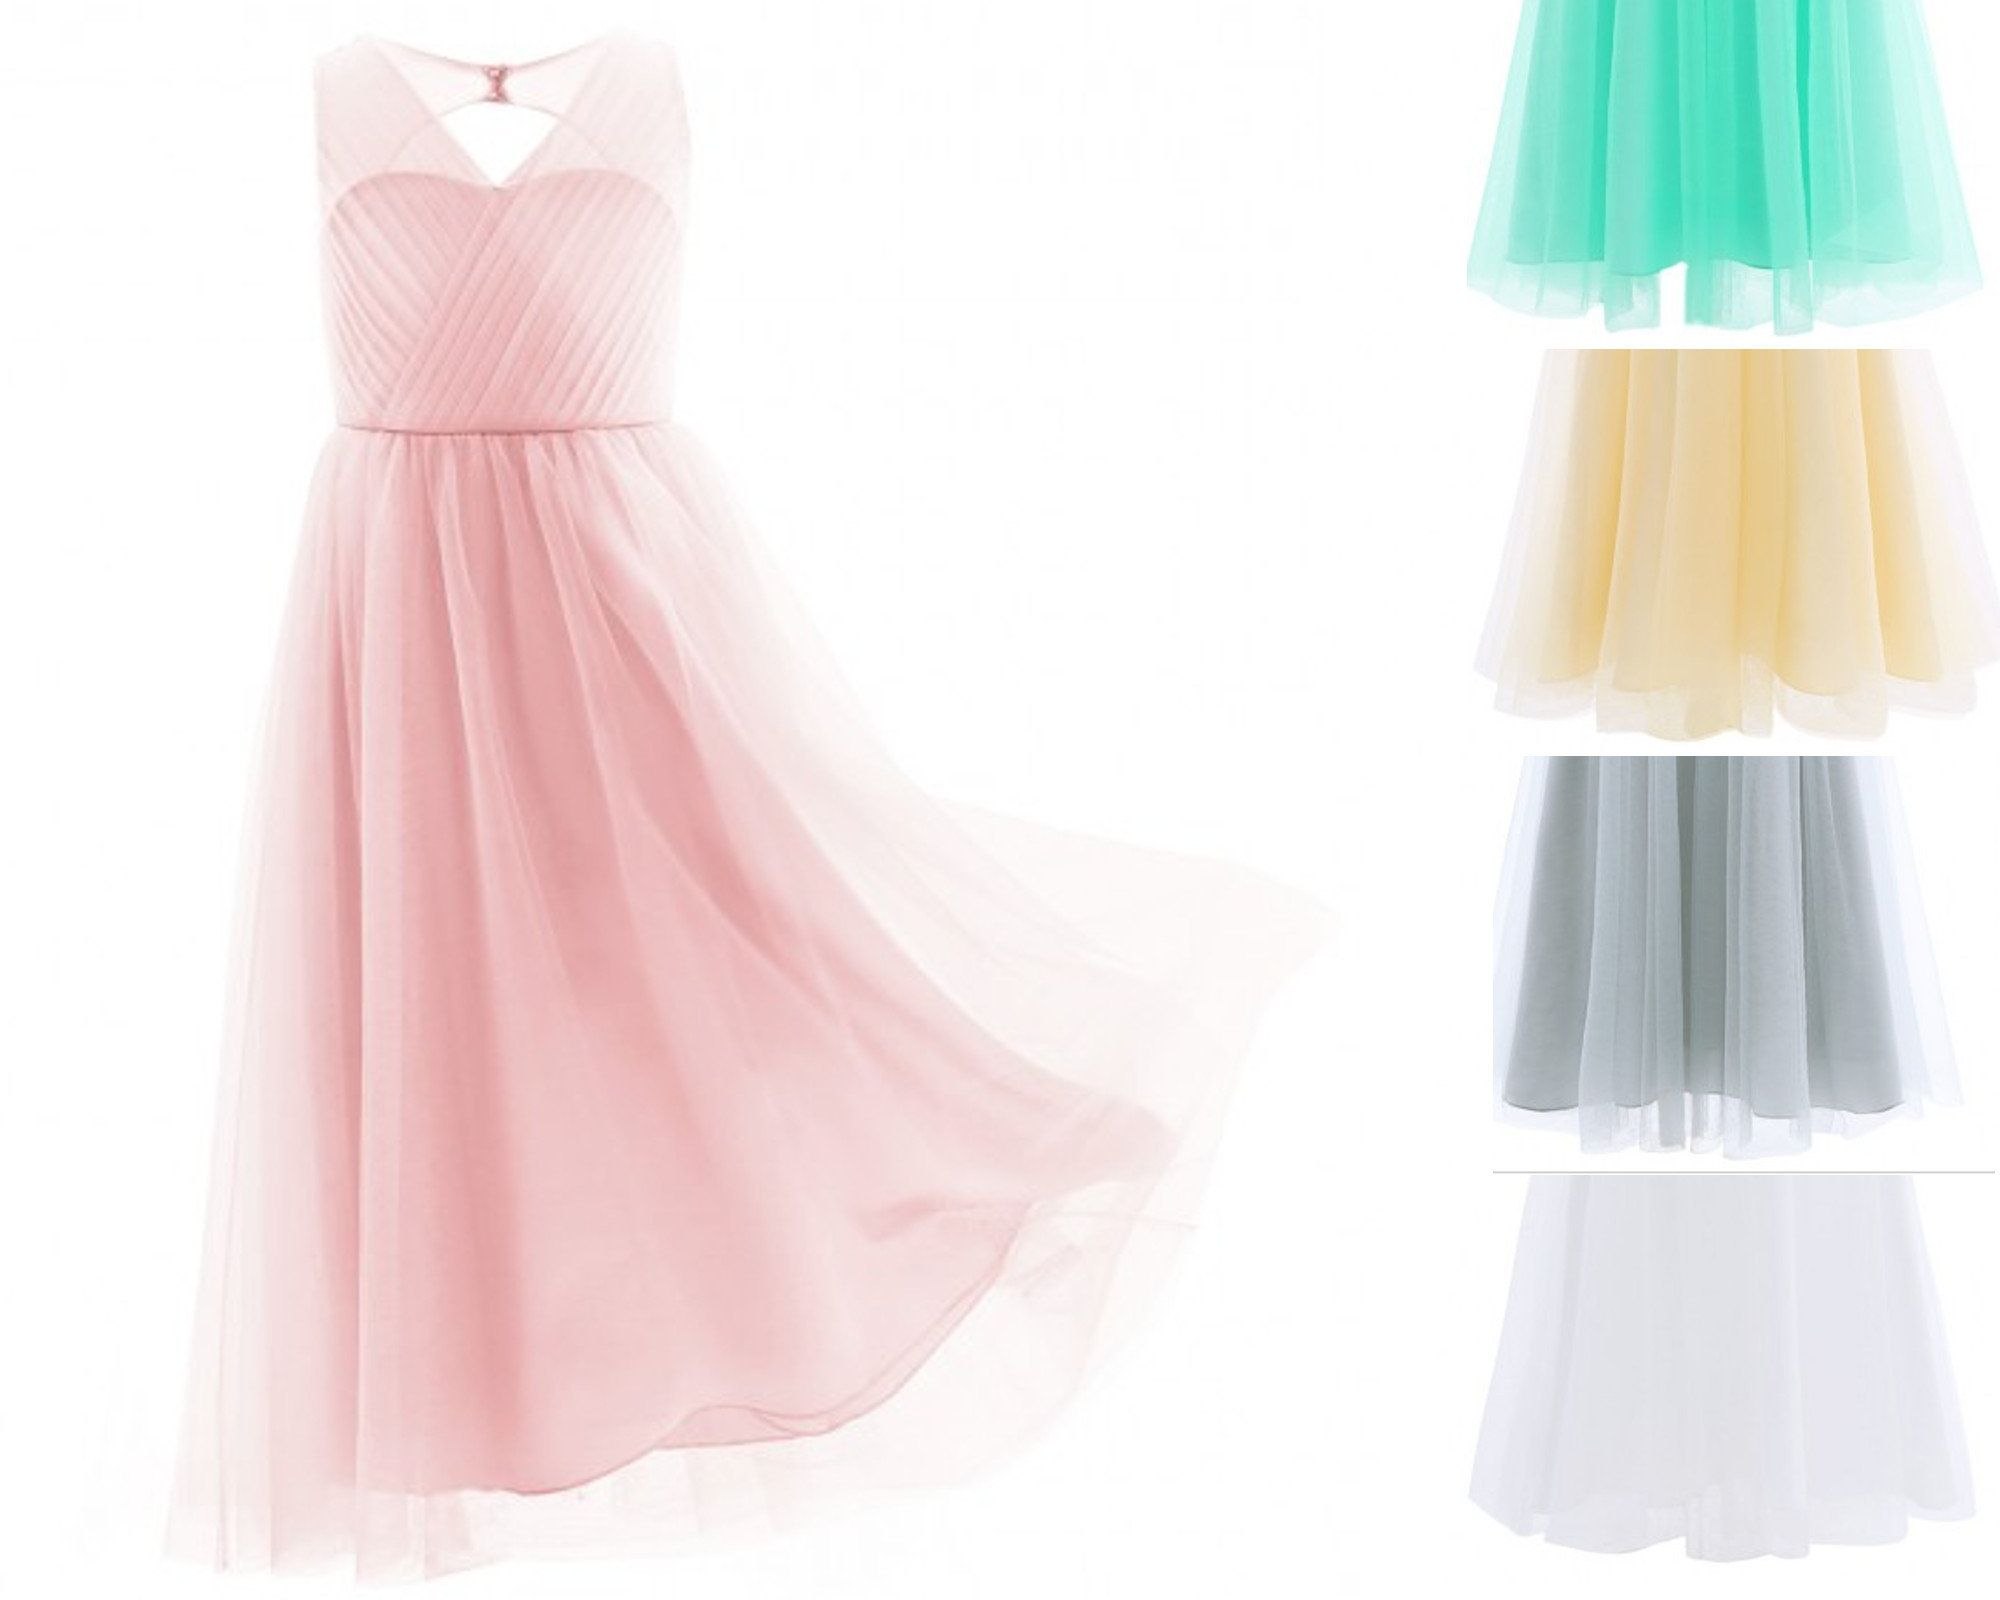 ee0a7ffc4e89 YiZYiF Kids Big Girls Backless Mesh Satin Summer Princess Bridesmaid Wedding  Dance Prom Party Dress  Amazon.co.uk  Clot…